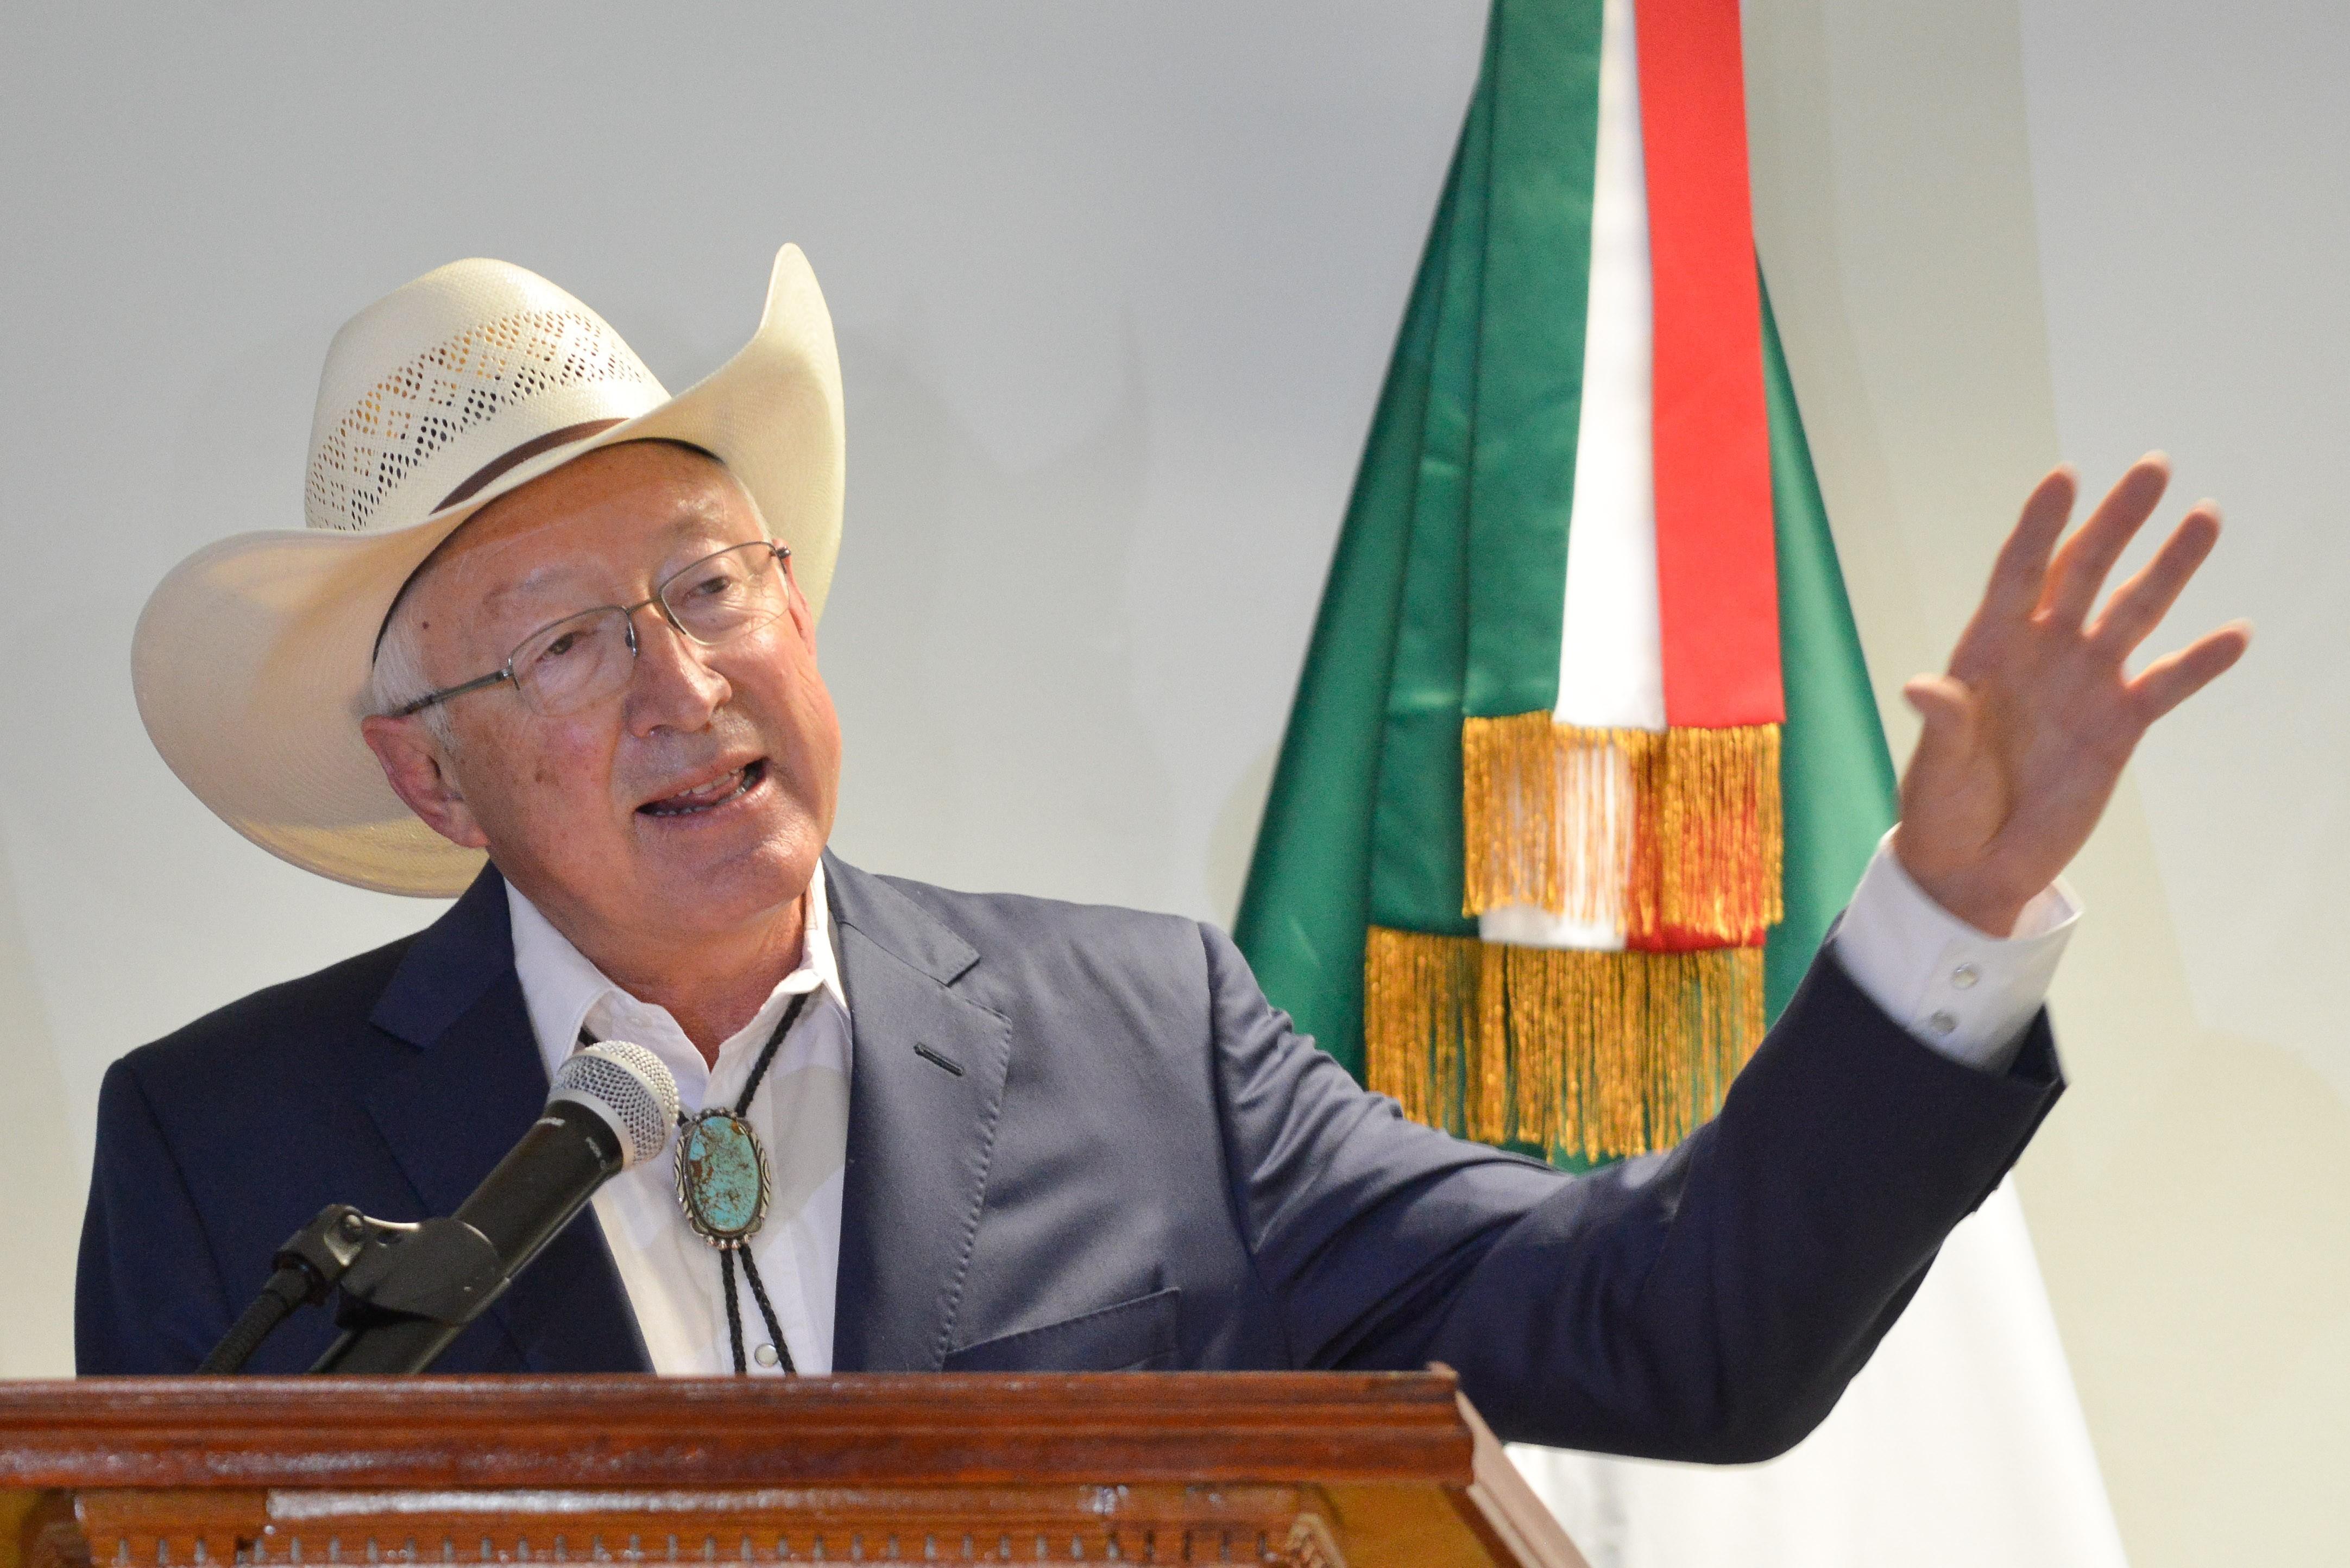 Llega Ken Salazar a México - Tribuna Campeche